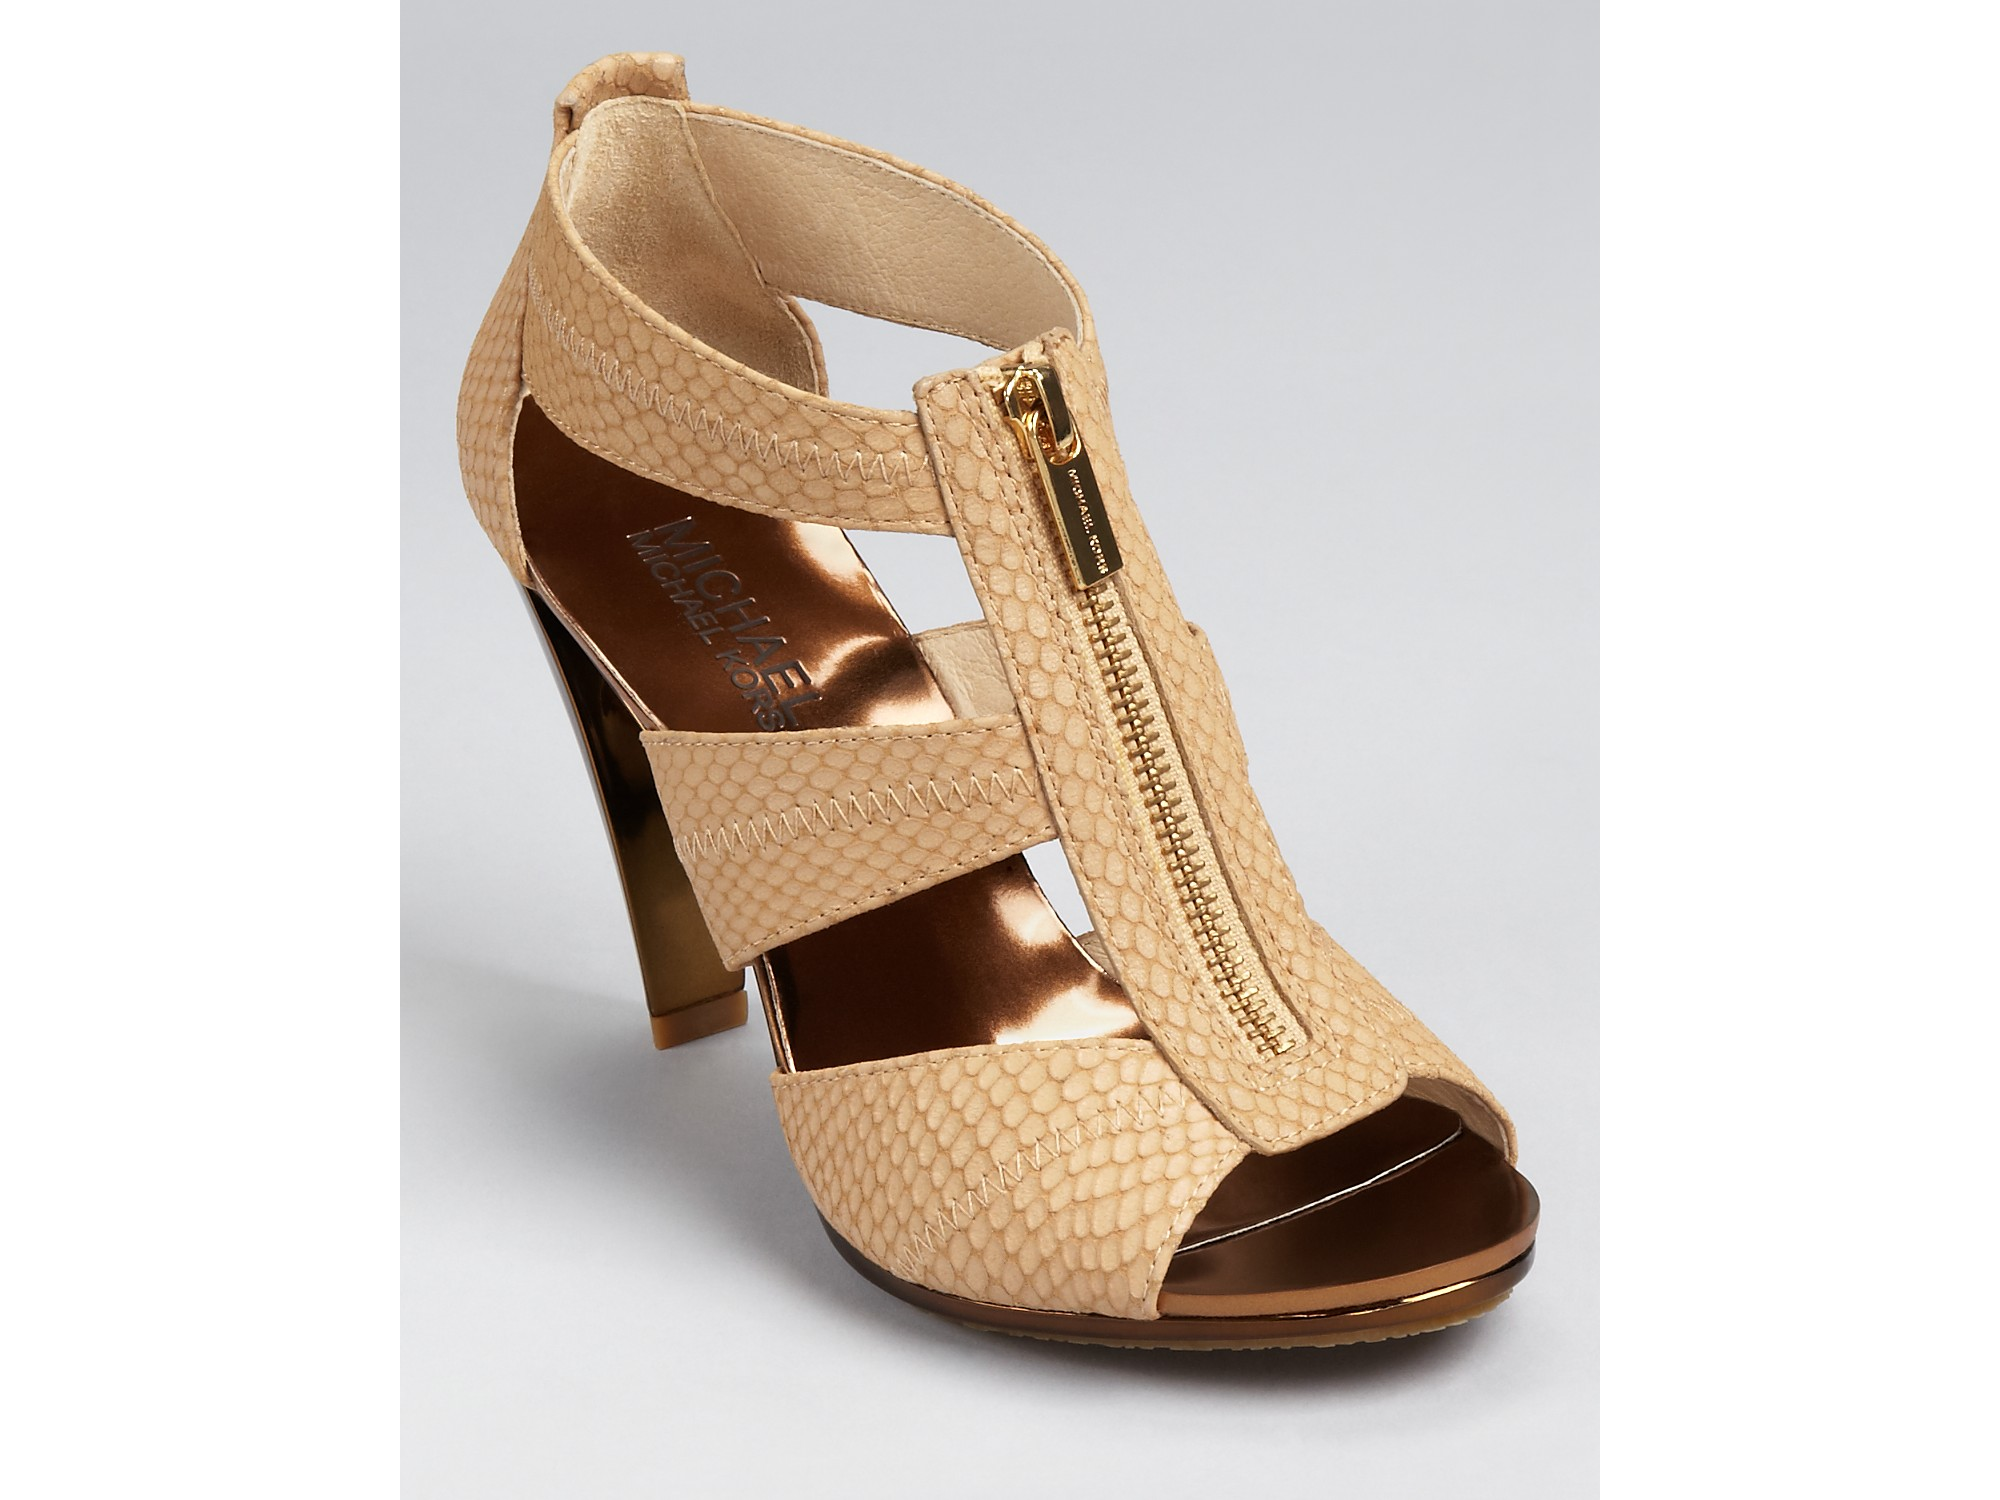 Michael Michael Kors Outlet: Shoes women | Wedge Shoes